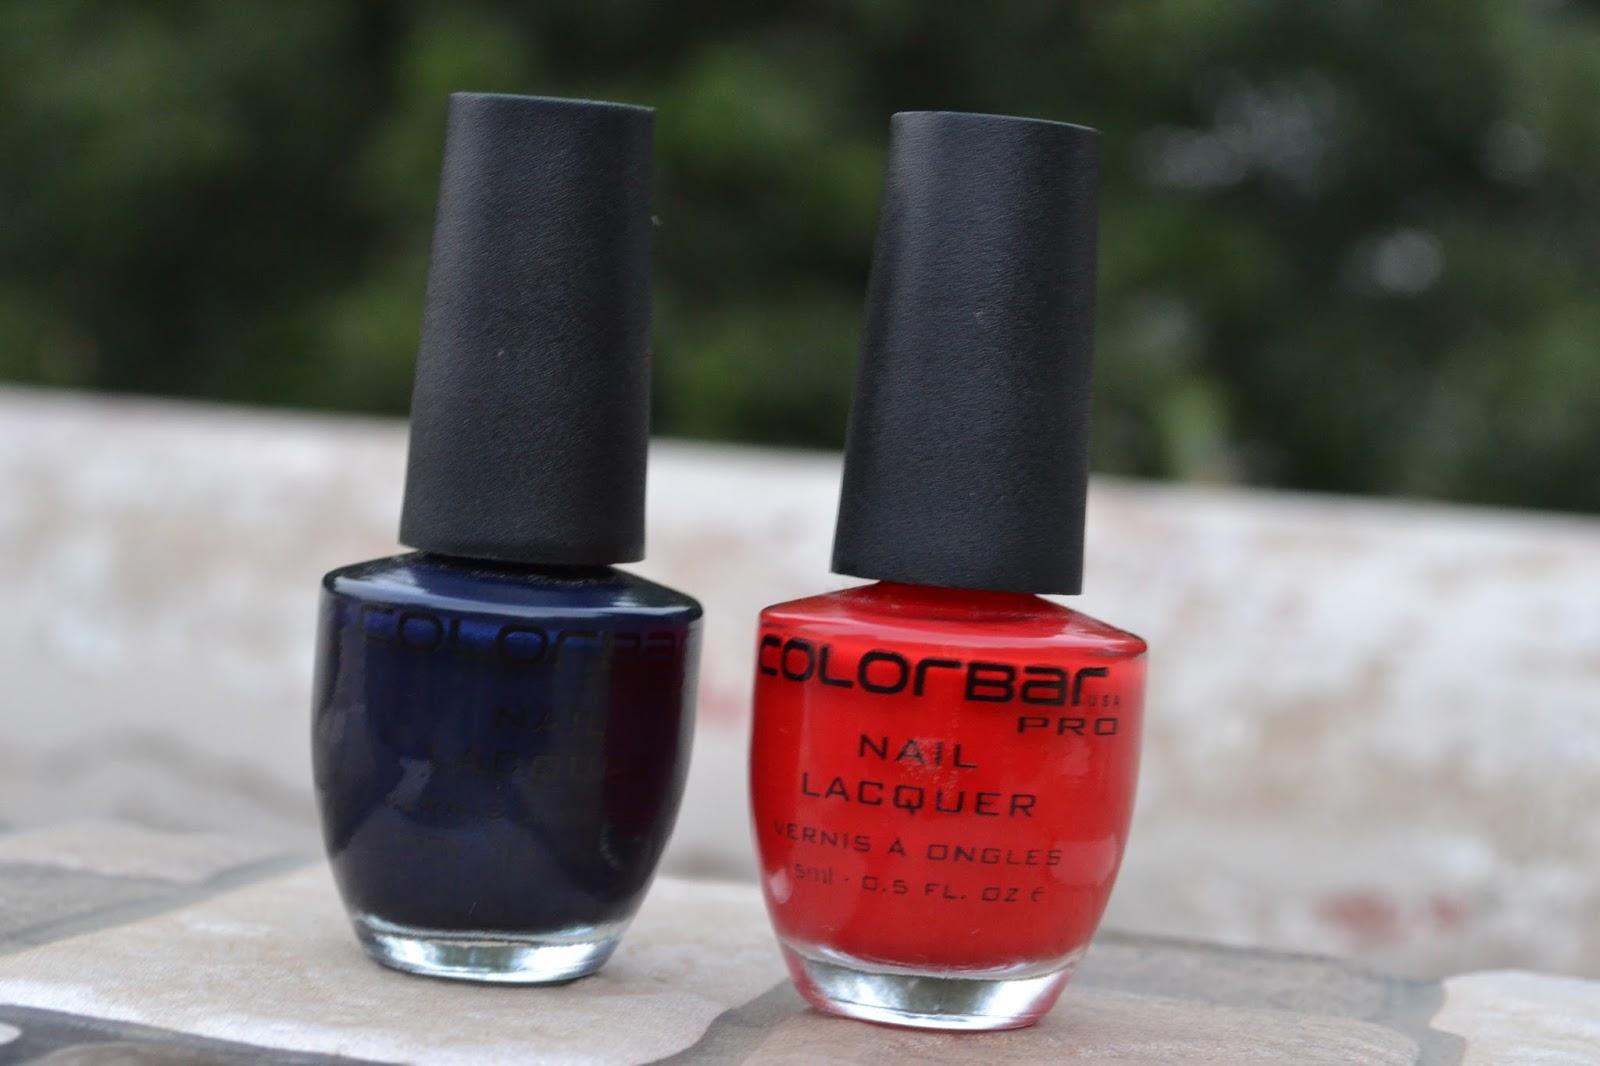 Colorbar Pro nail lacquer